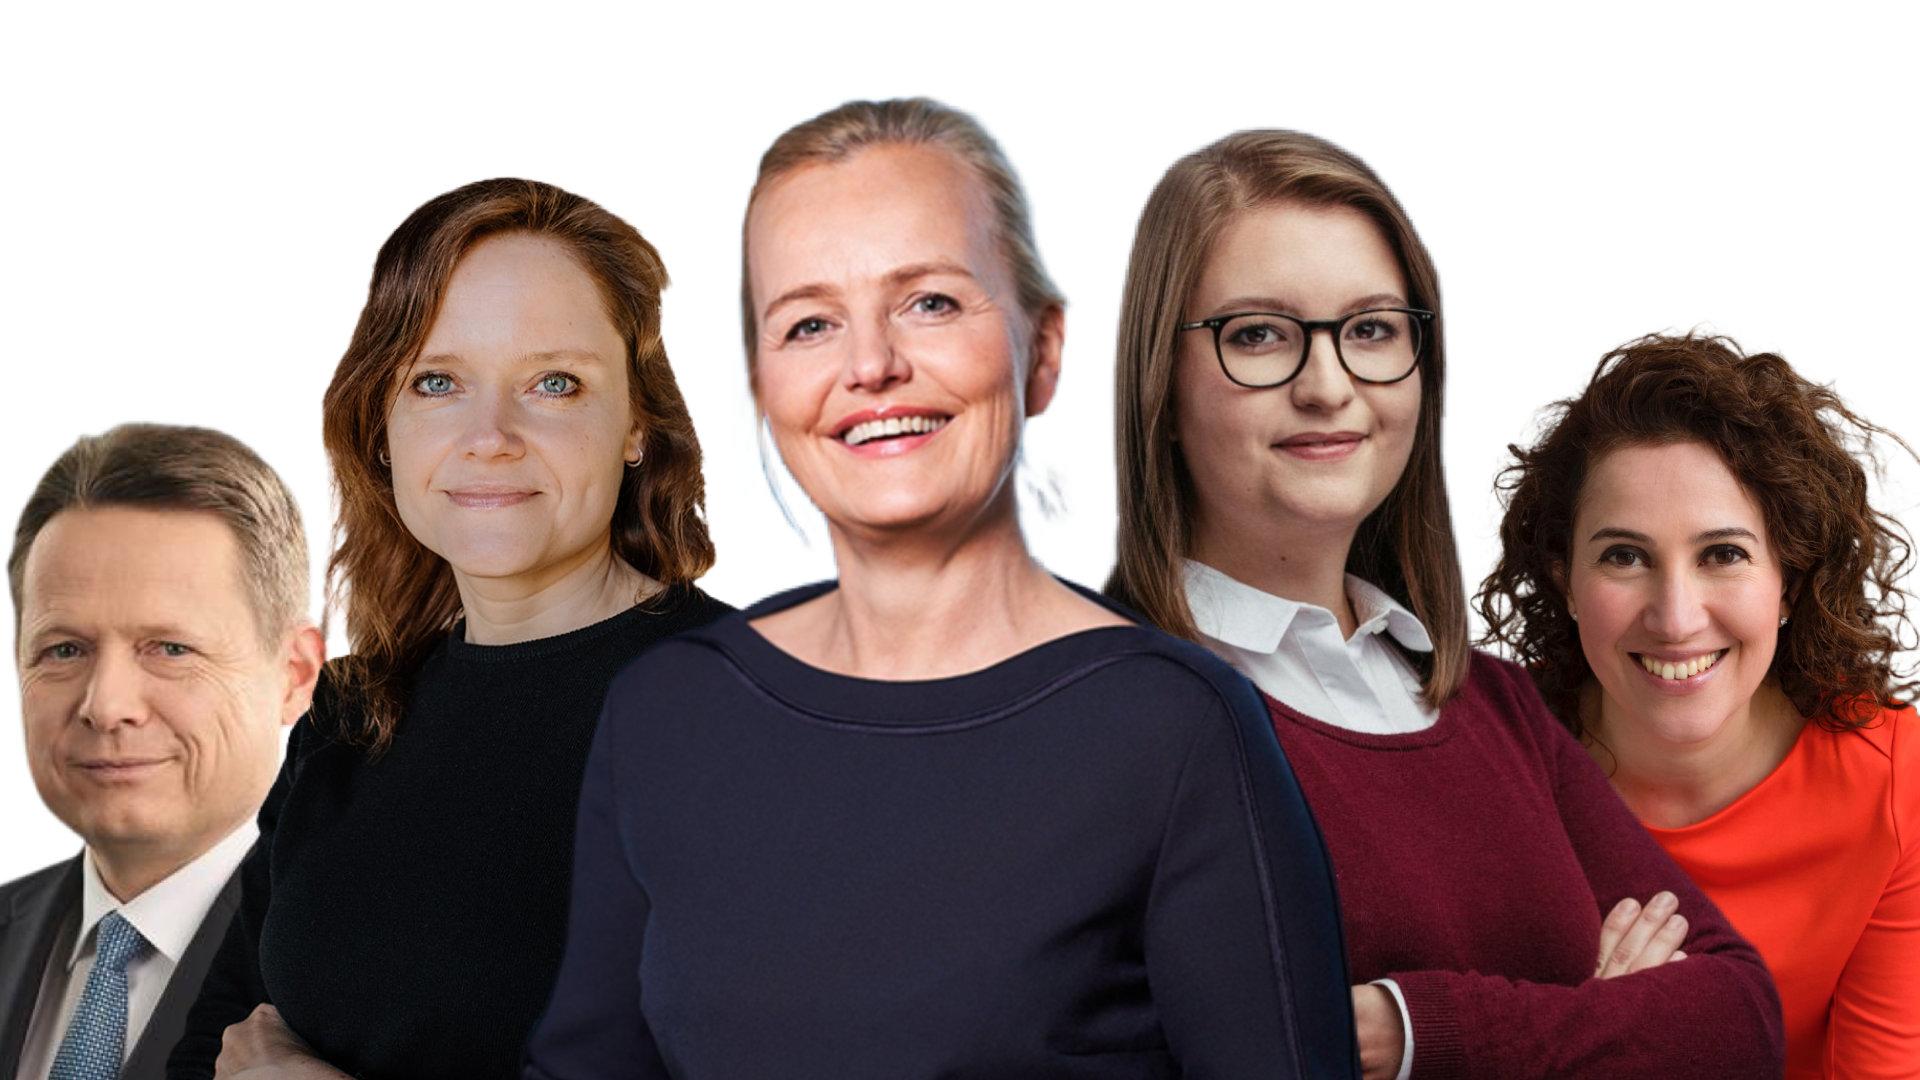 Delia D. König (Solarisbank), Andrea Fernandez (Alice), Cornelia Schwertner, Dr. Ralph Müller (Fintech-Investor/Vorstand IKB), Ute König-Stemmler (Visa)